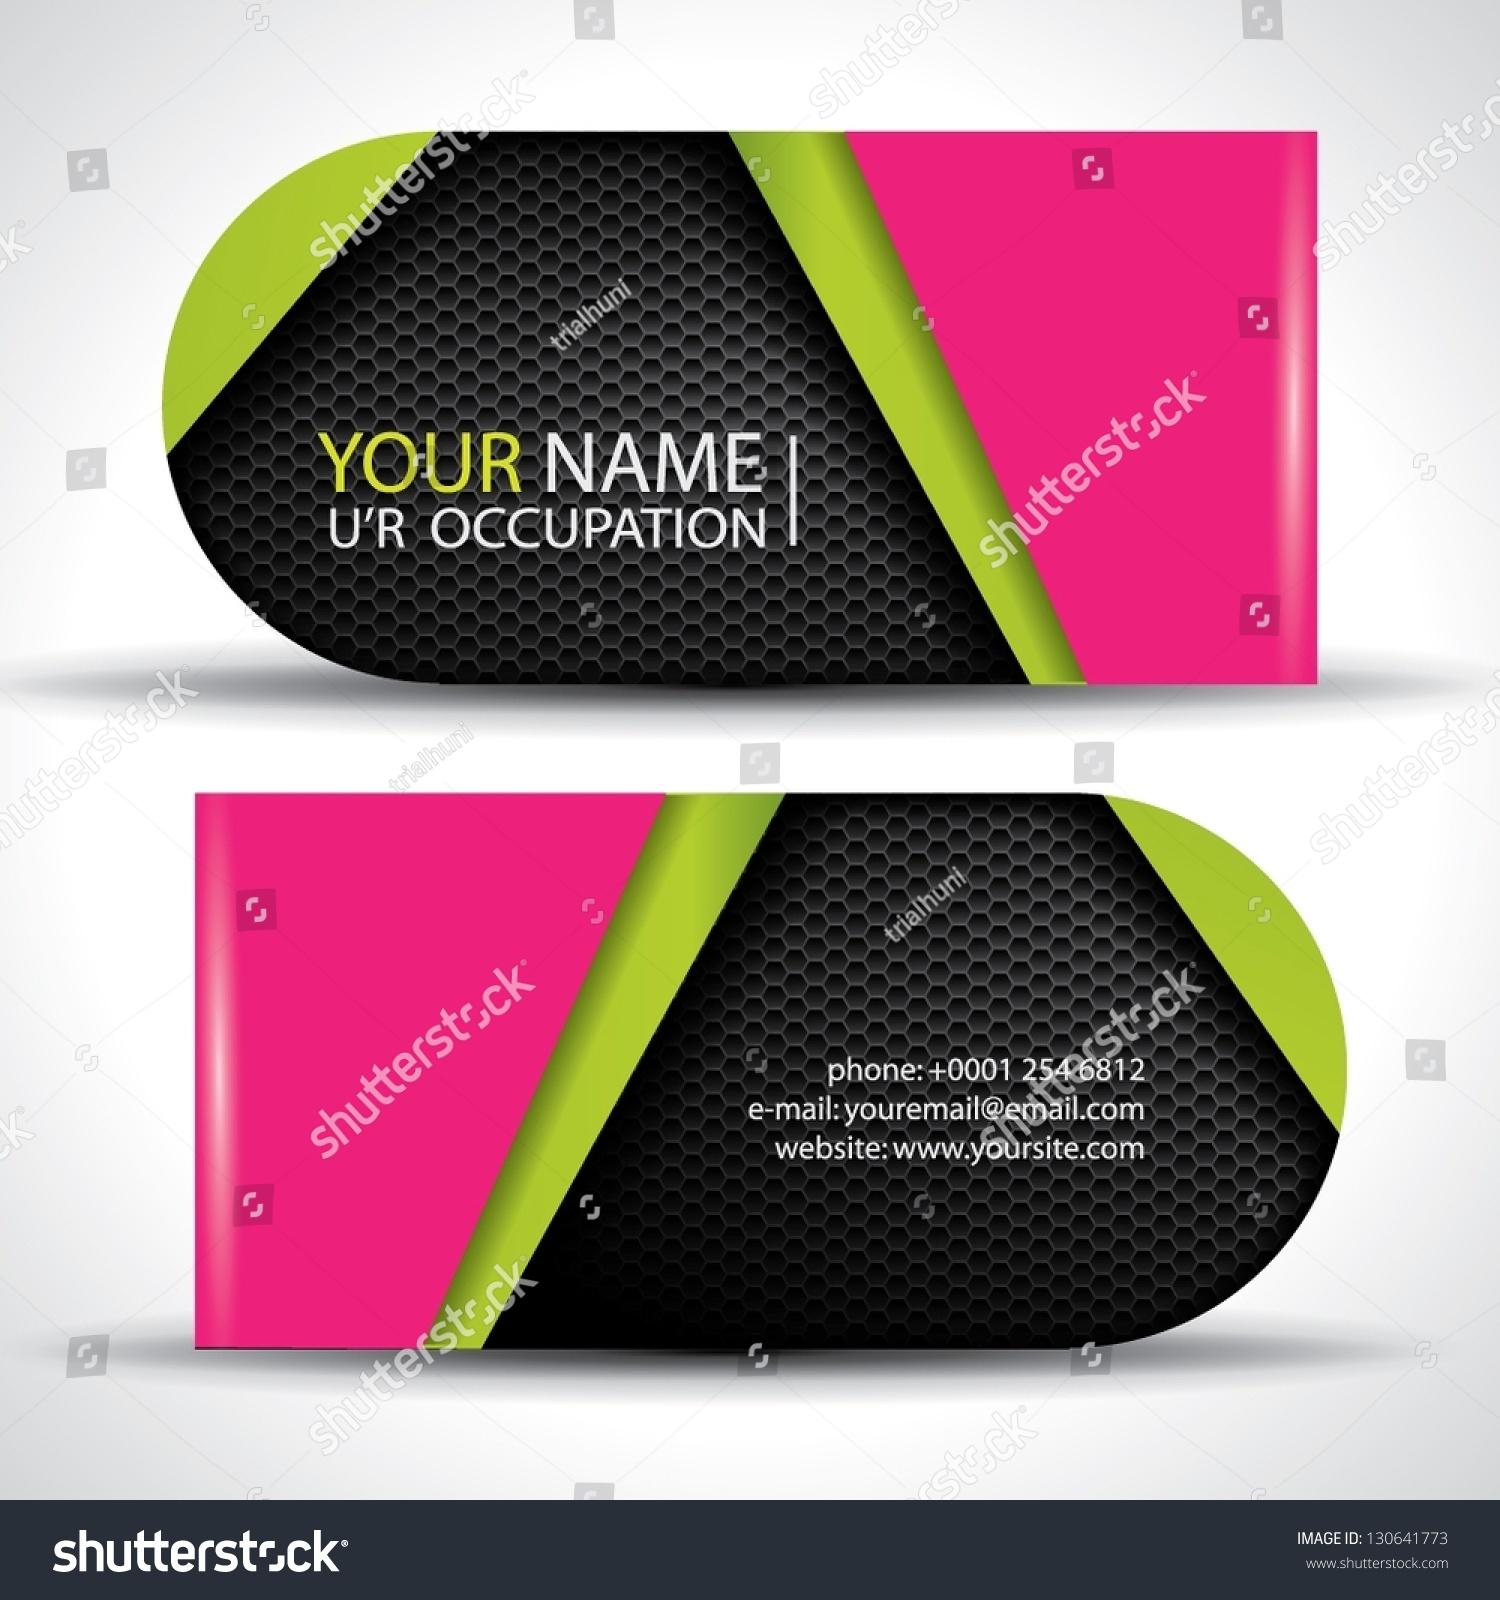 Vector Business Card Green Pink Black Stock Vector 130641773 ...